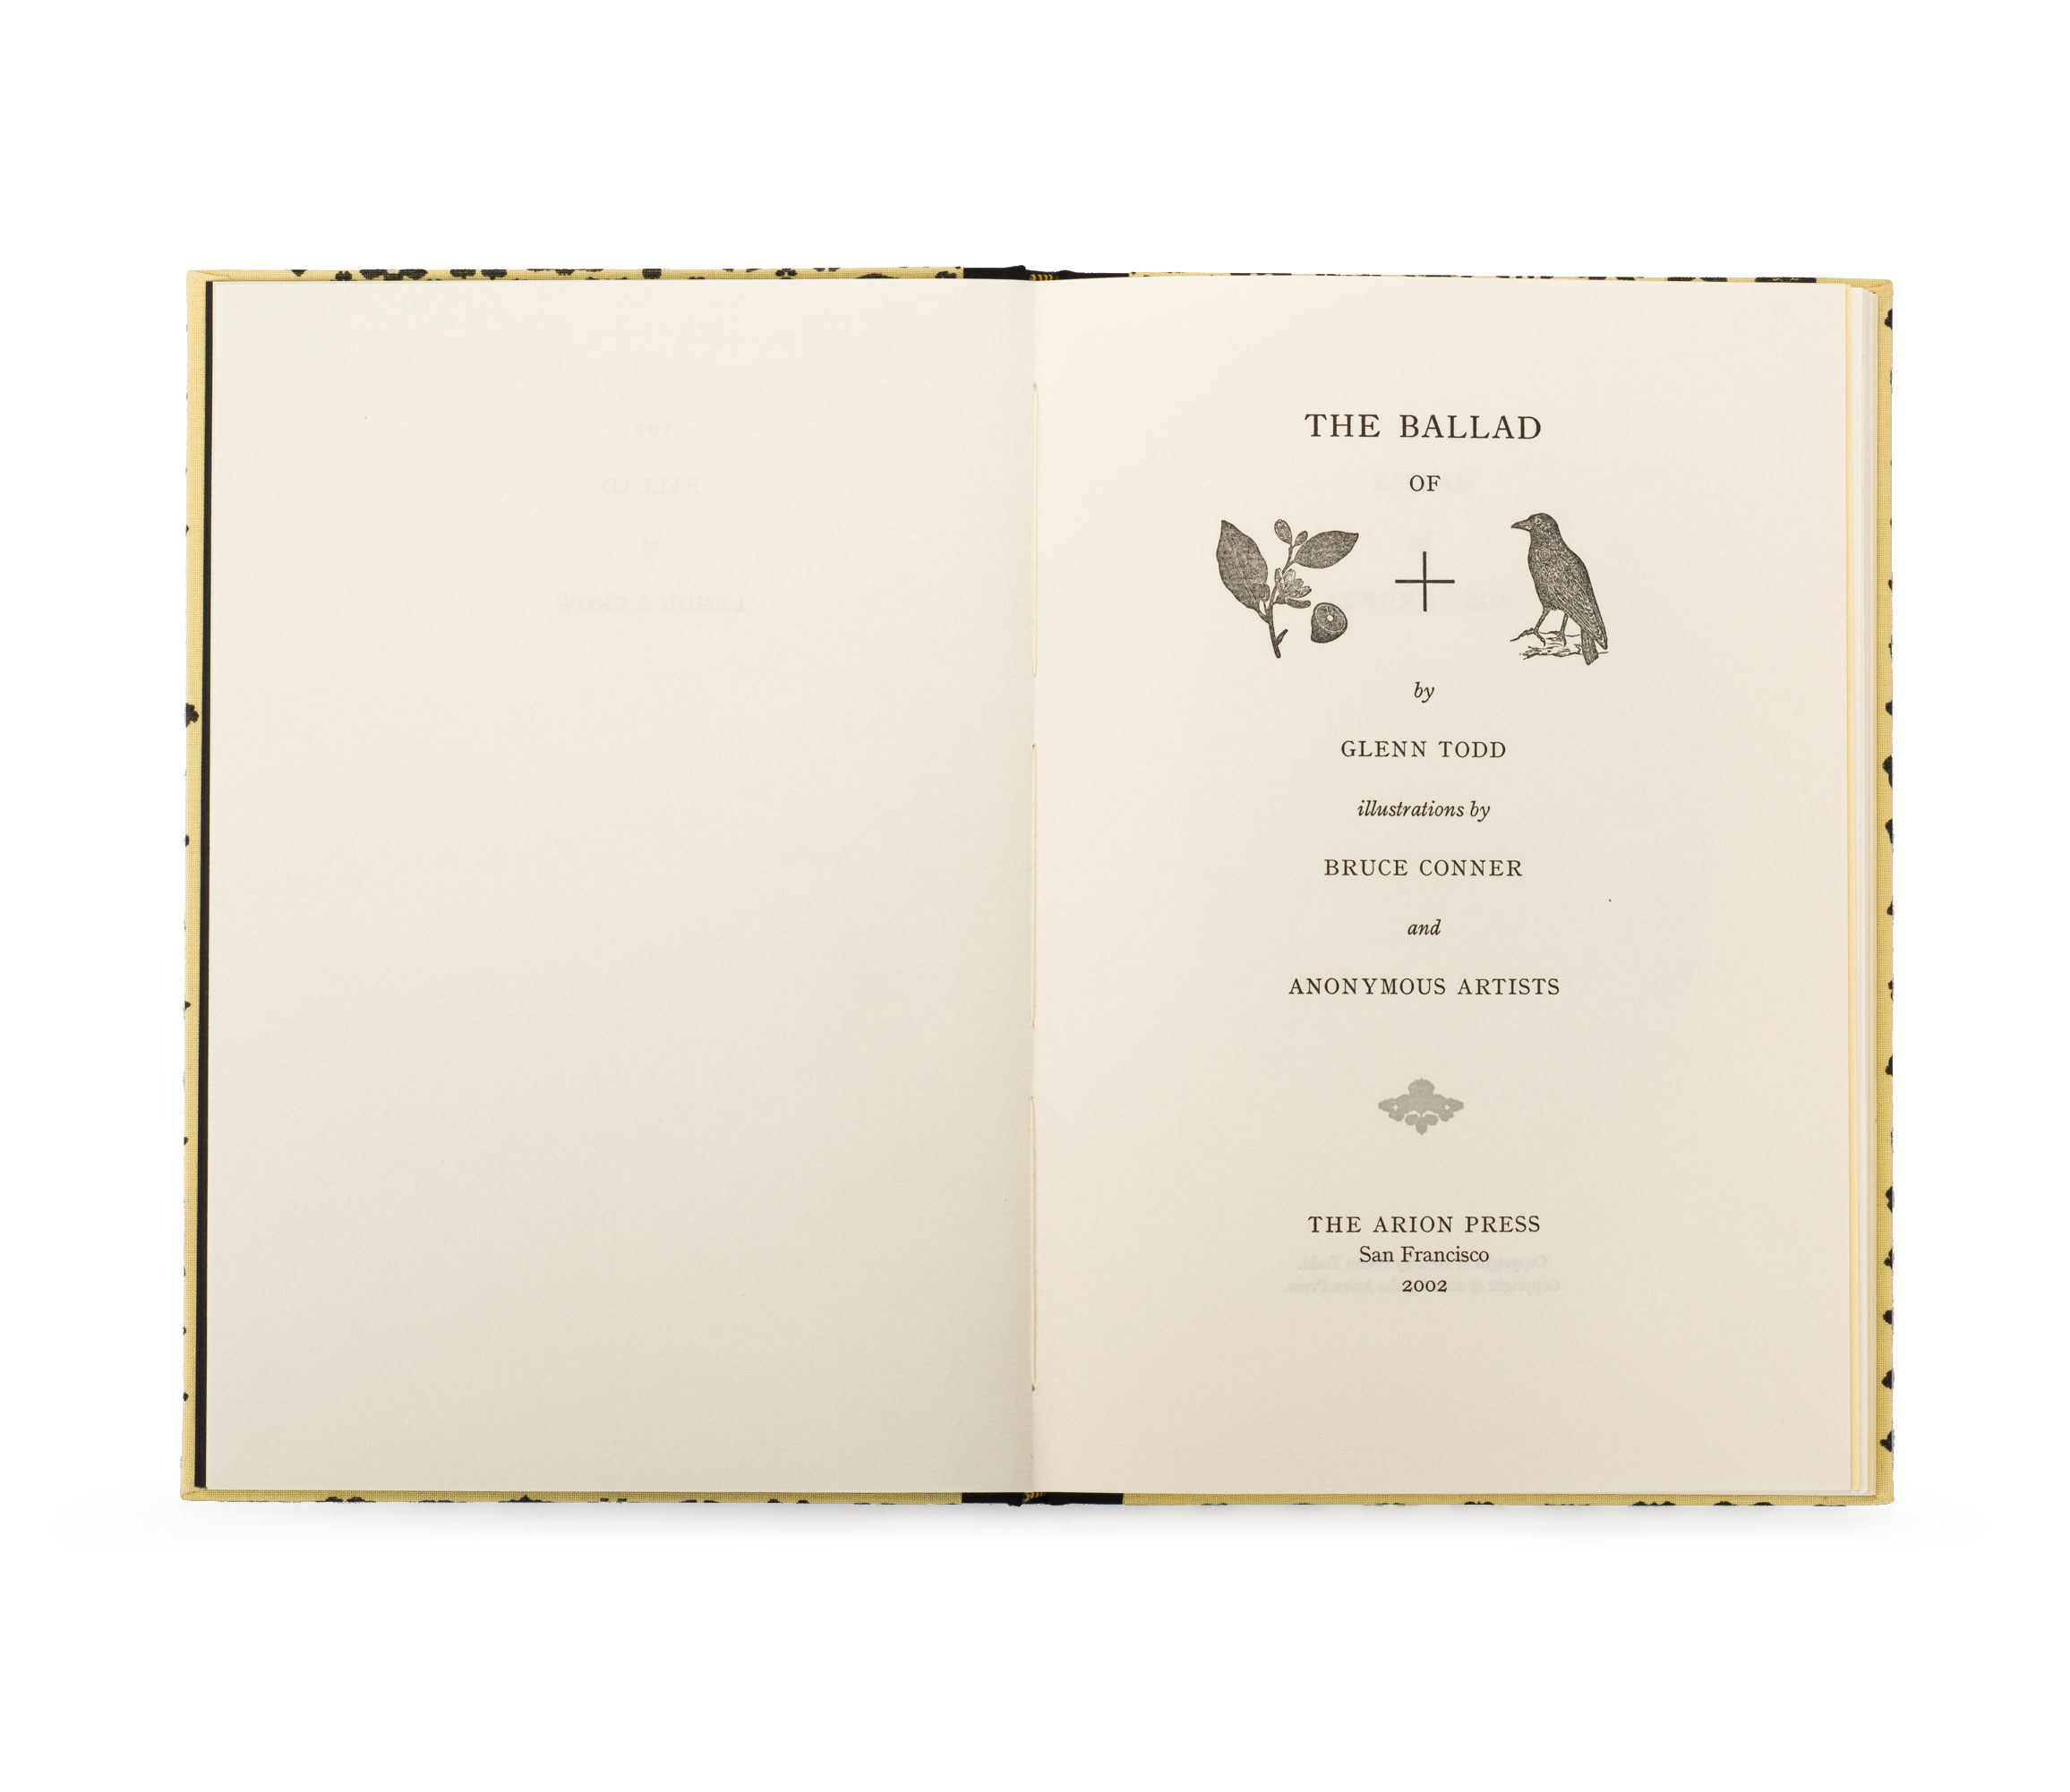 063_The-Ballad-of-Lemon-and-Crow-Title-fix.jpg